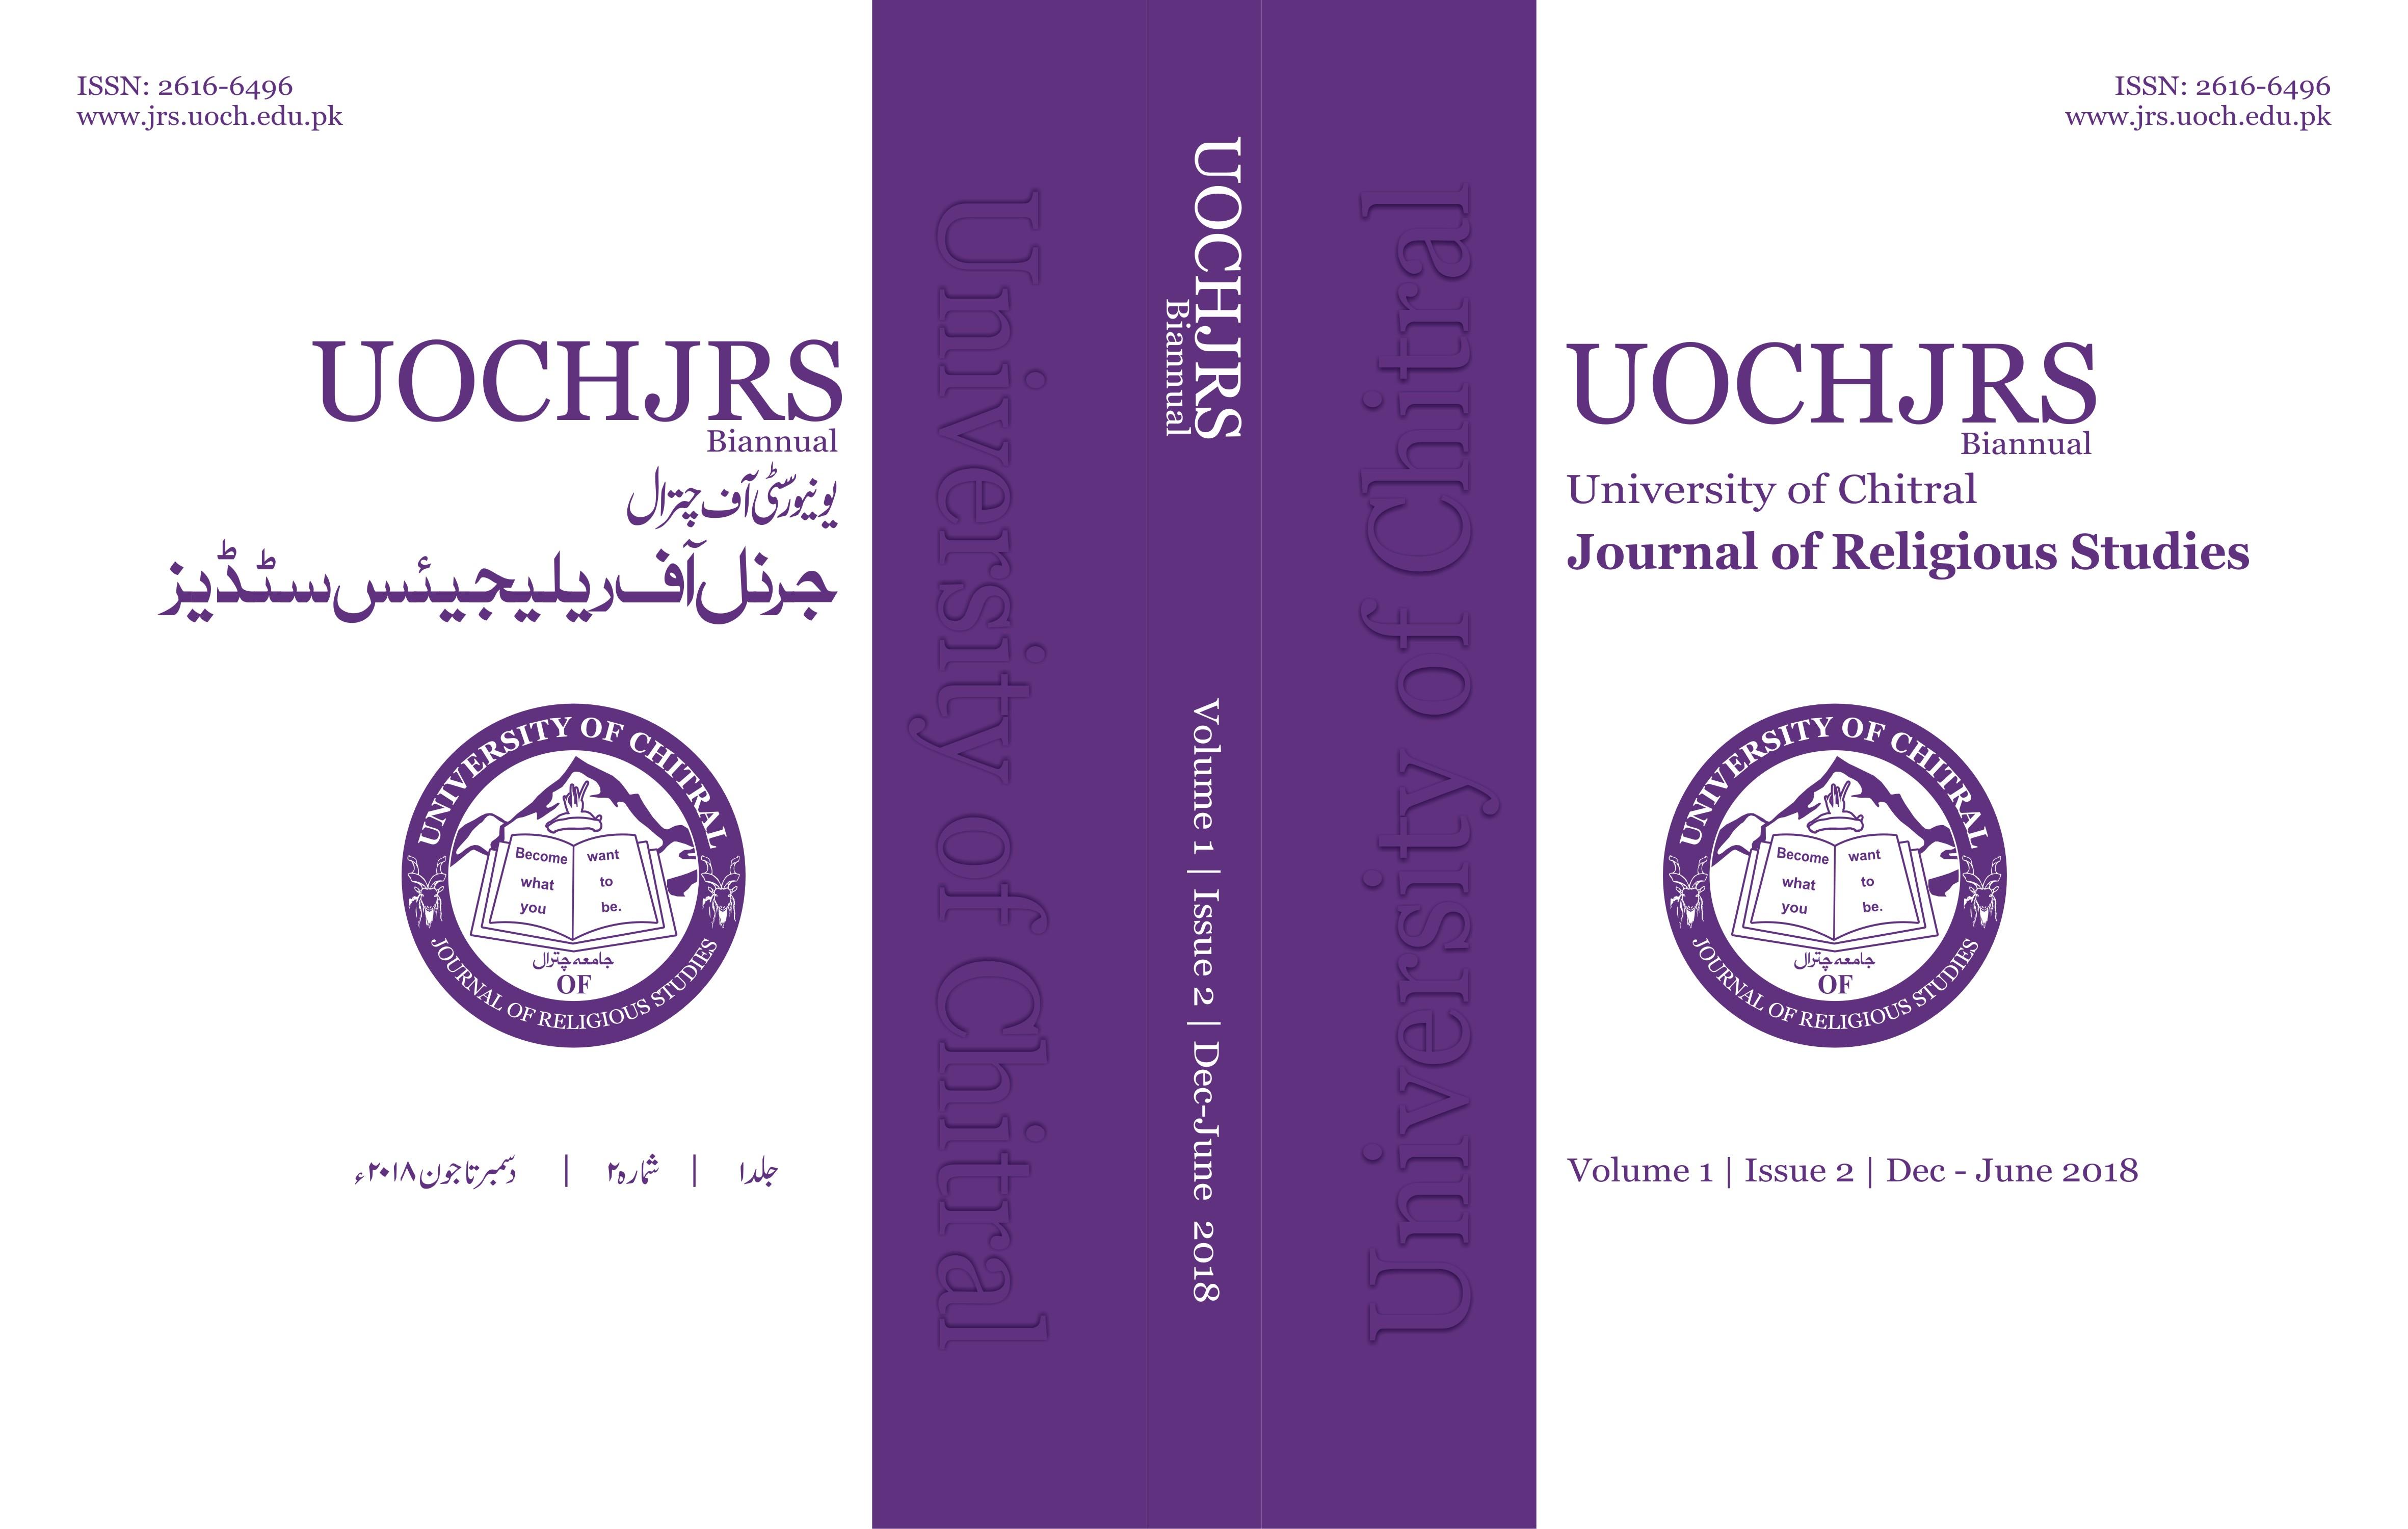 UOCHJRS